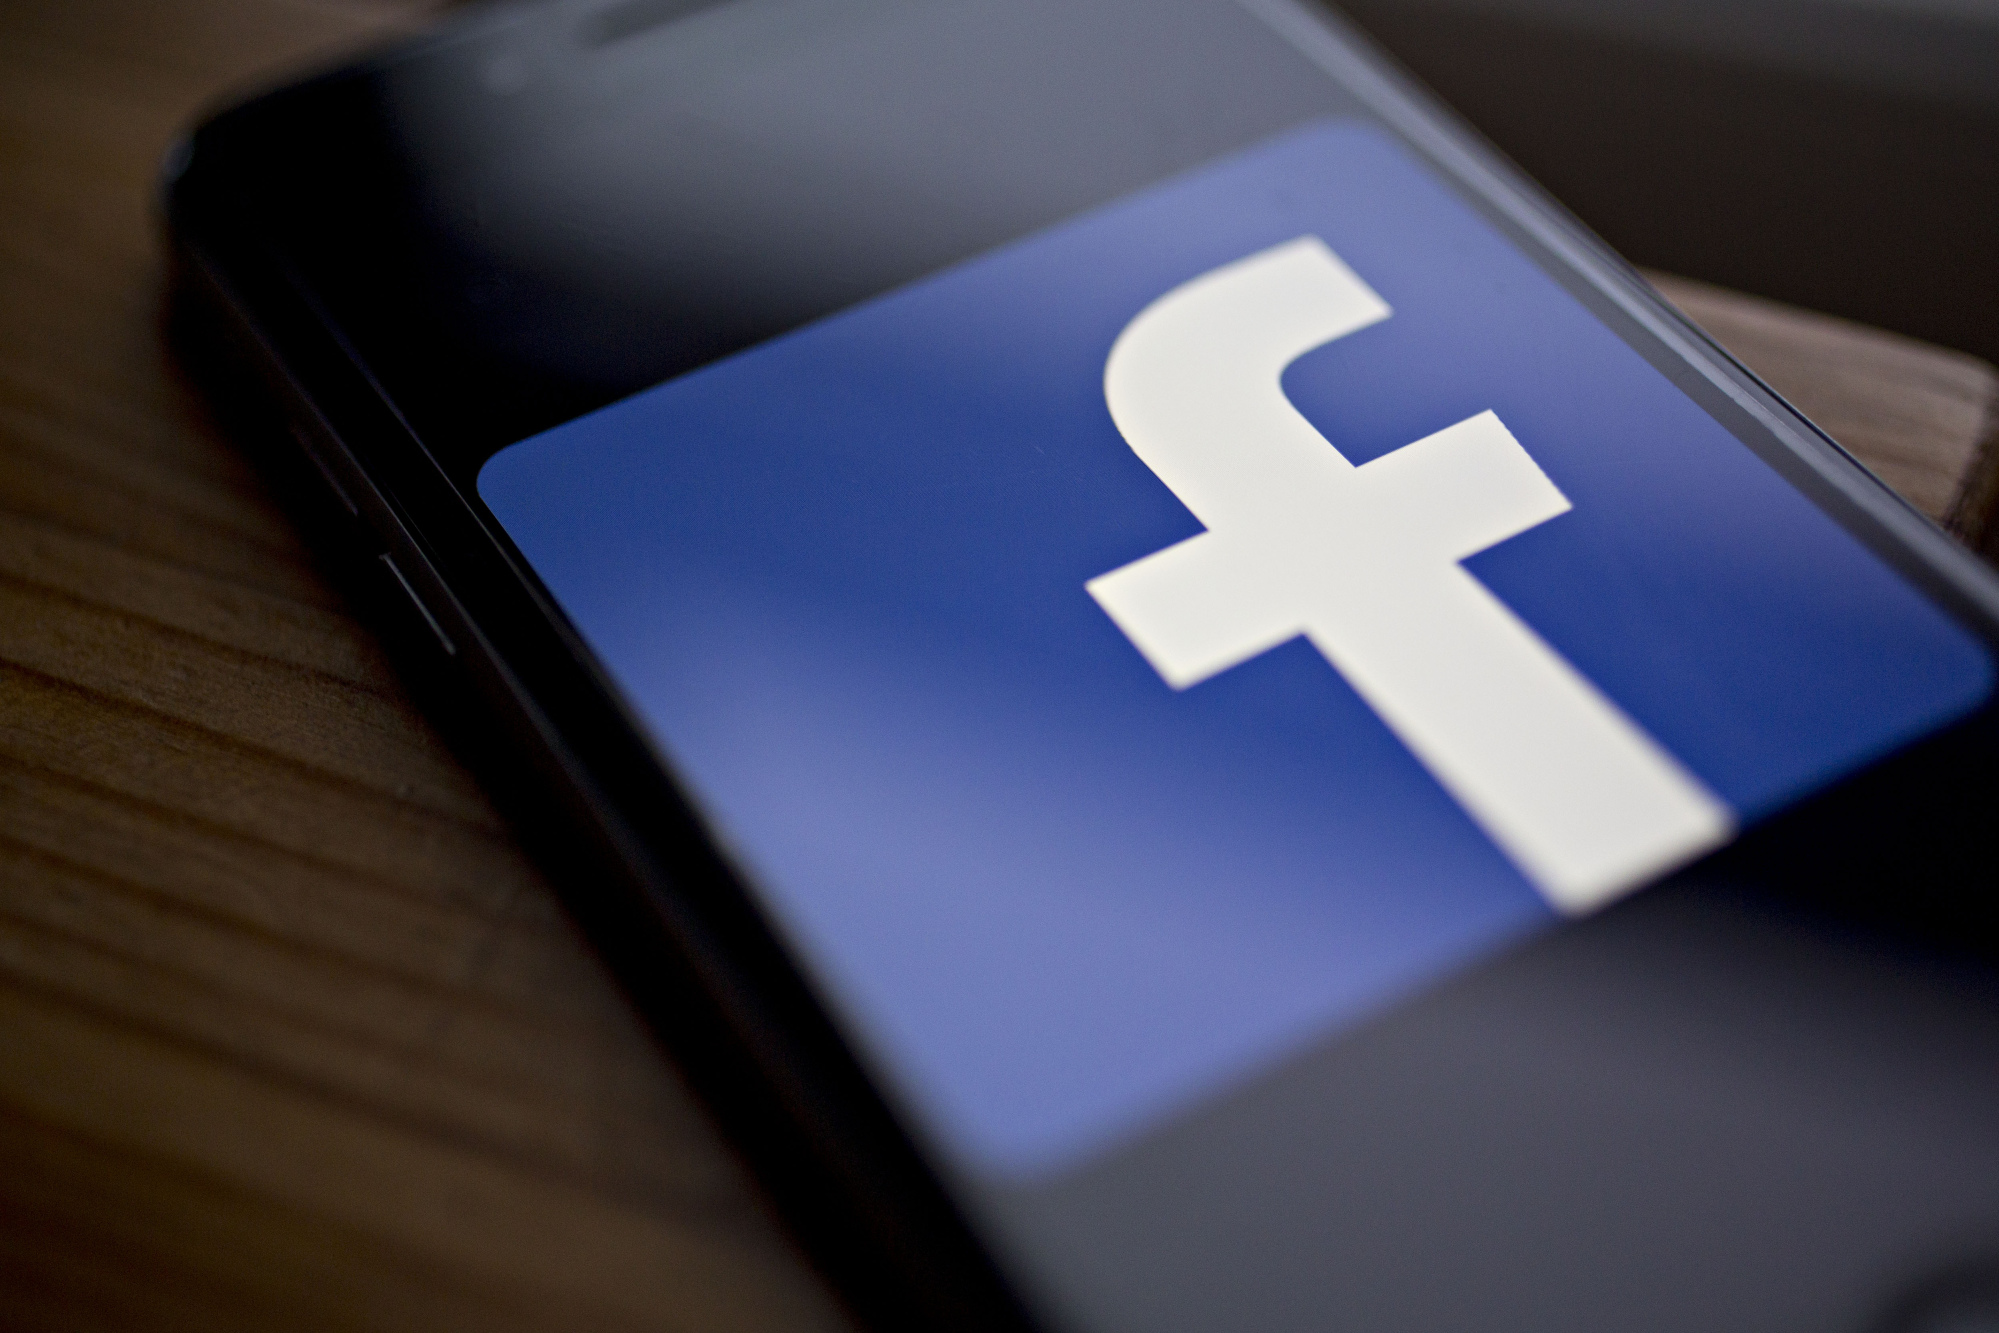 Fbnasdaq Gs Stock Quote Facebook Inc Bloomberg Markets